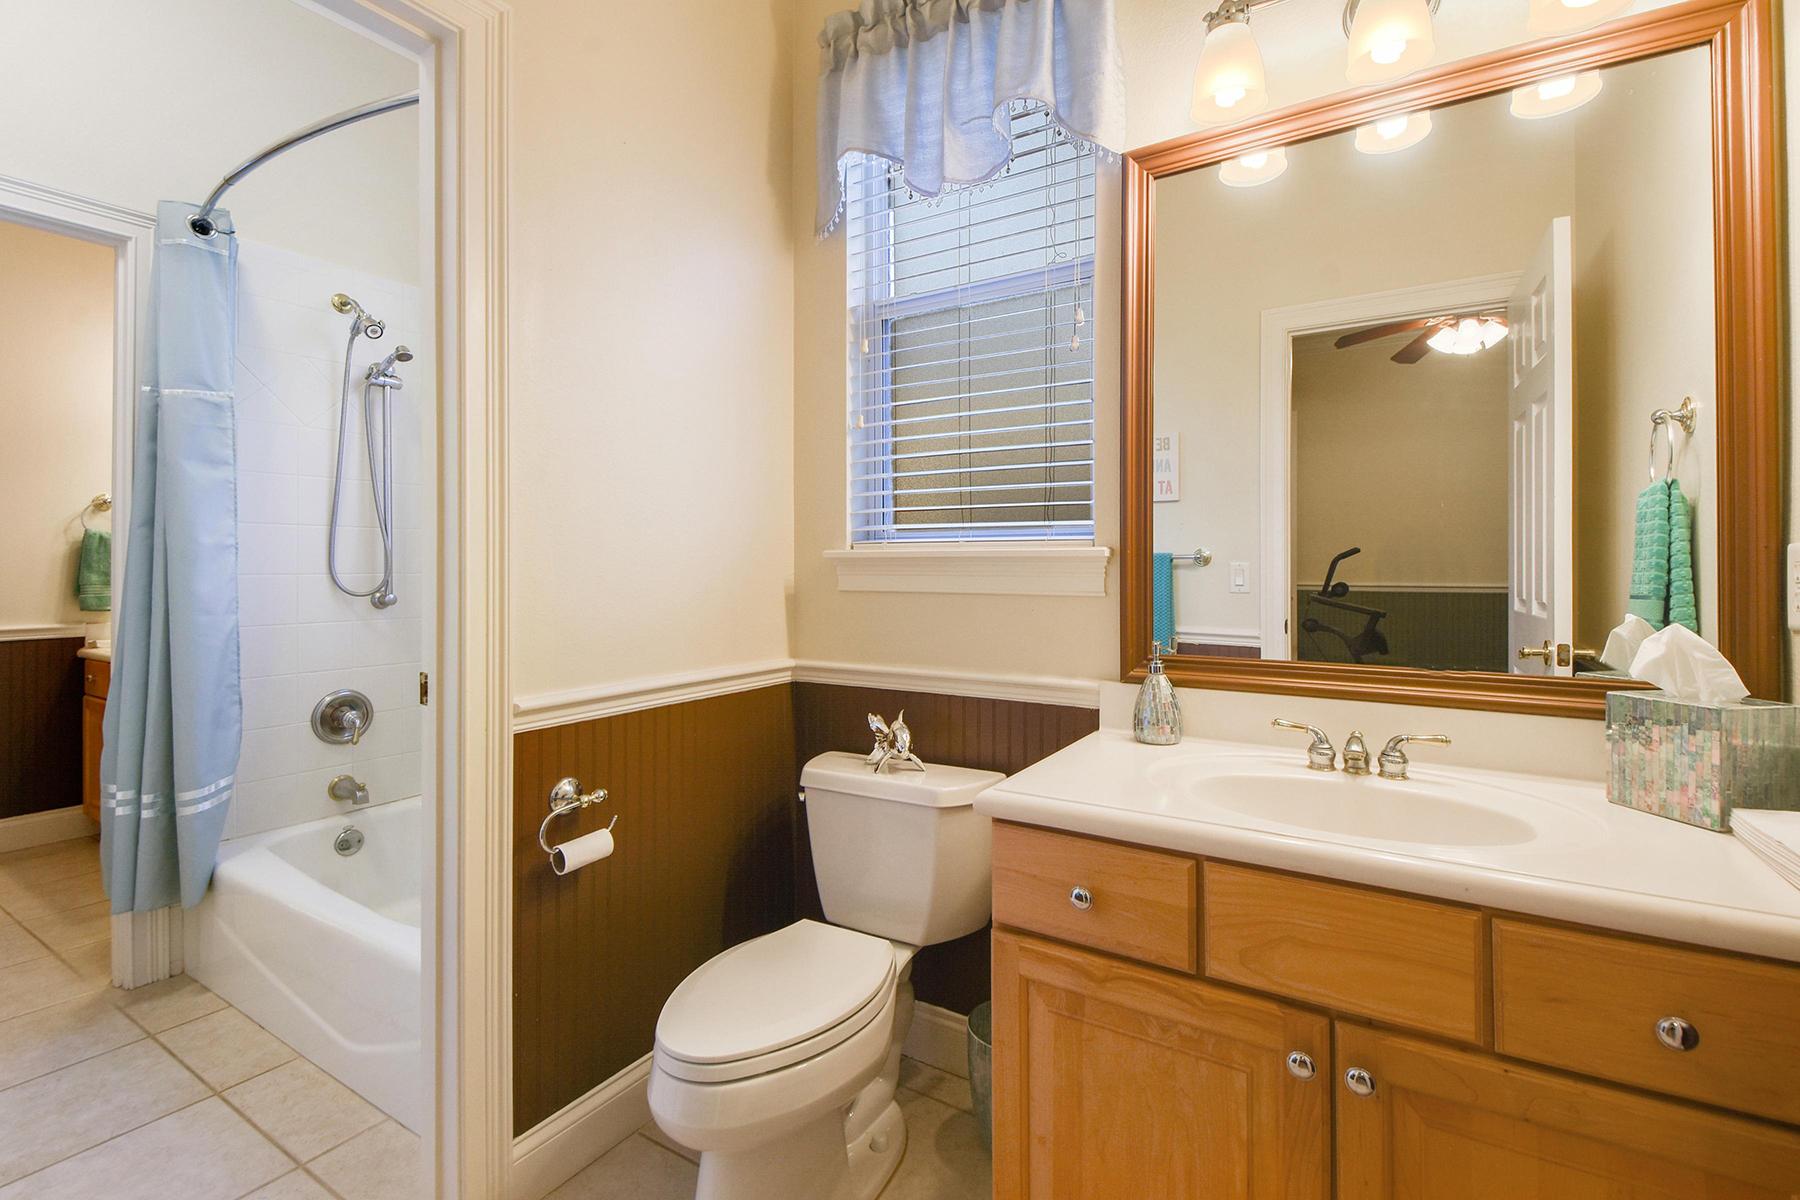 Additional photo for property listing at 1903 Lake Roberts Ct , Windermere, FL 34786 1903  Lake Roberts Ct,  Windermere, Florida 34786 United States